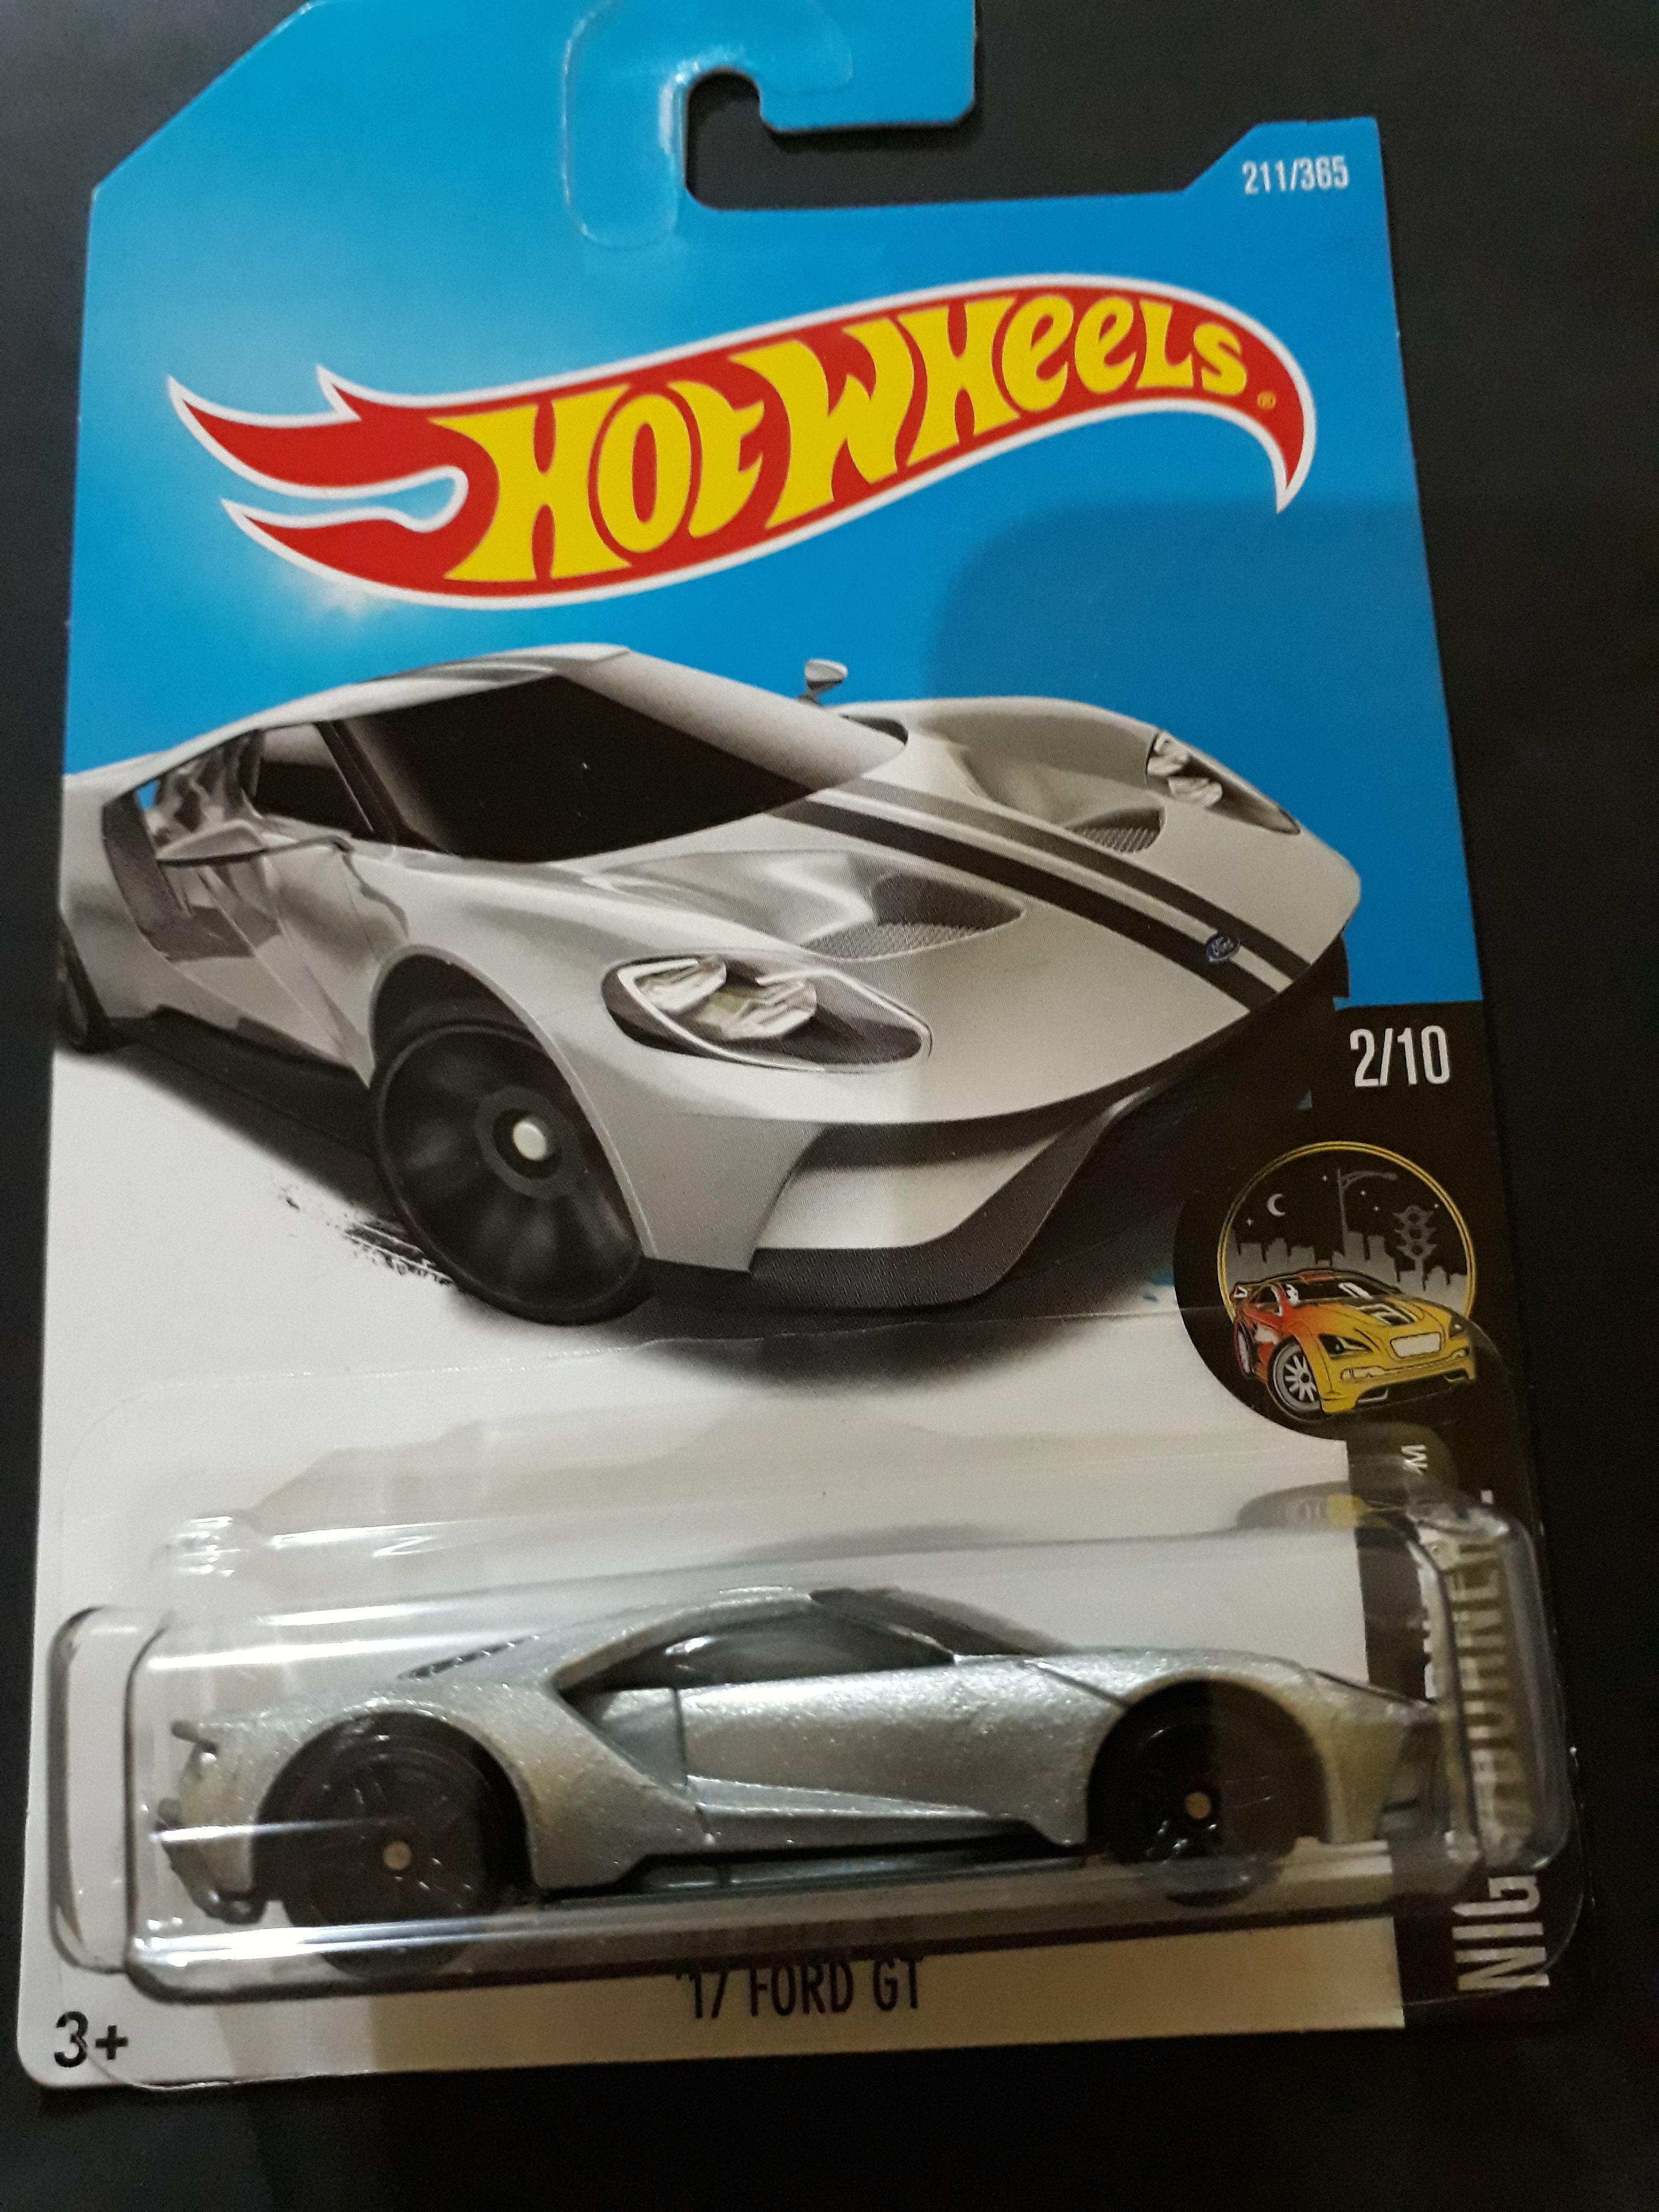 211 365 Hot Wheels Garage Hot Weels Hot Wheels Cars